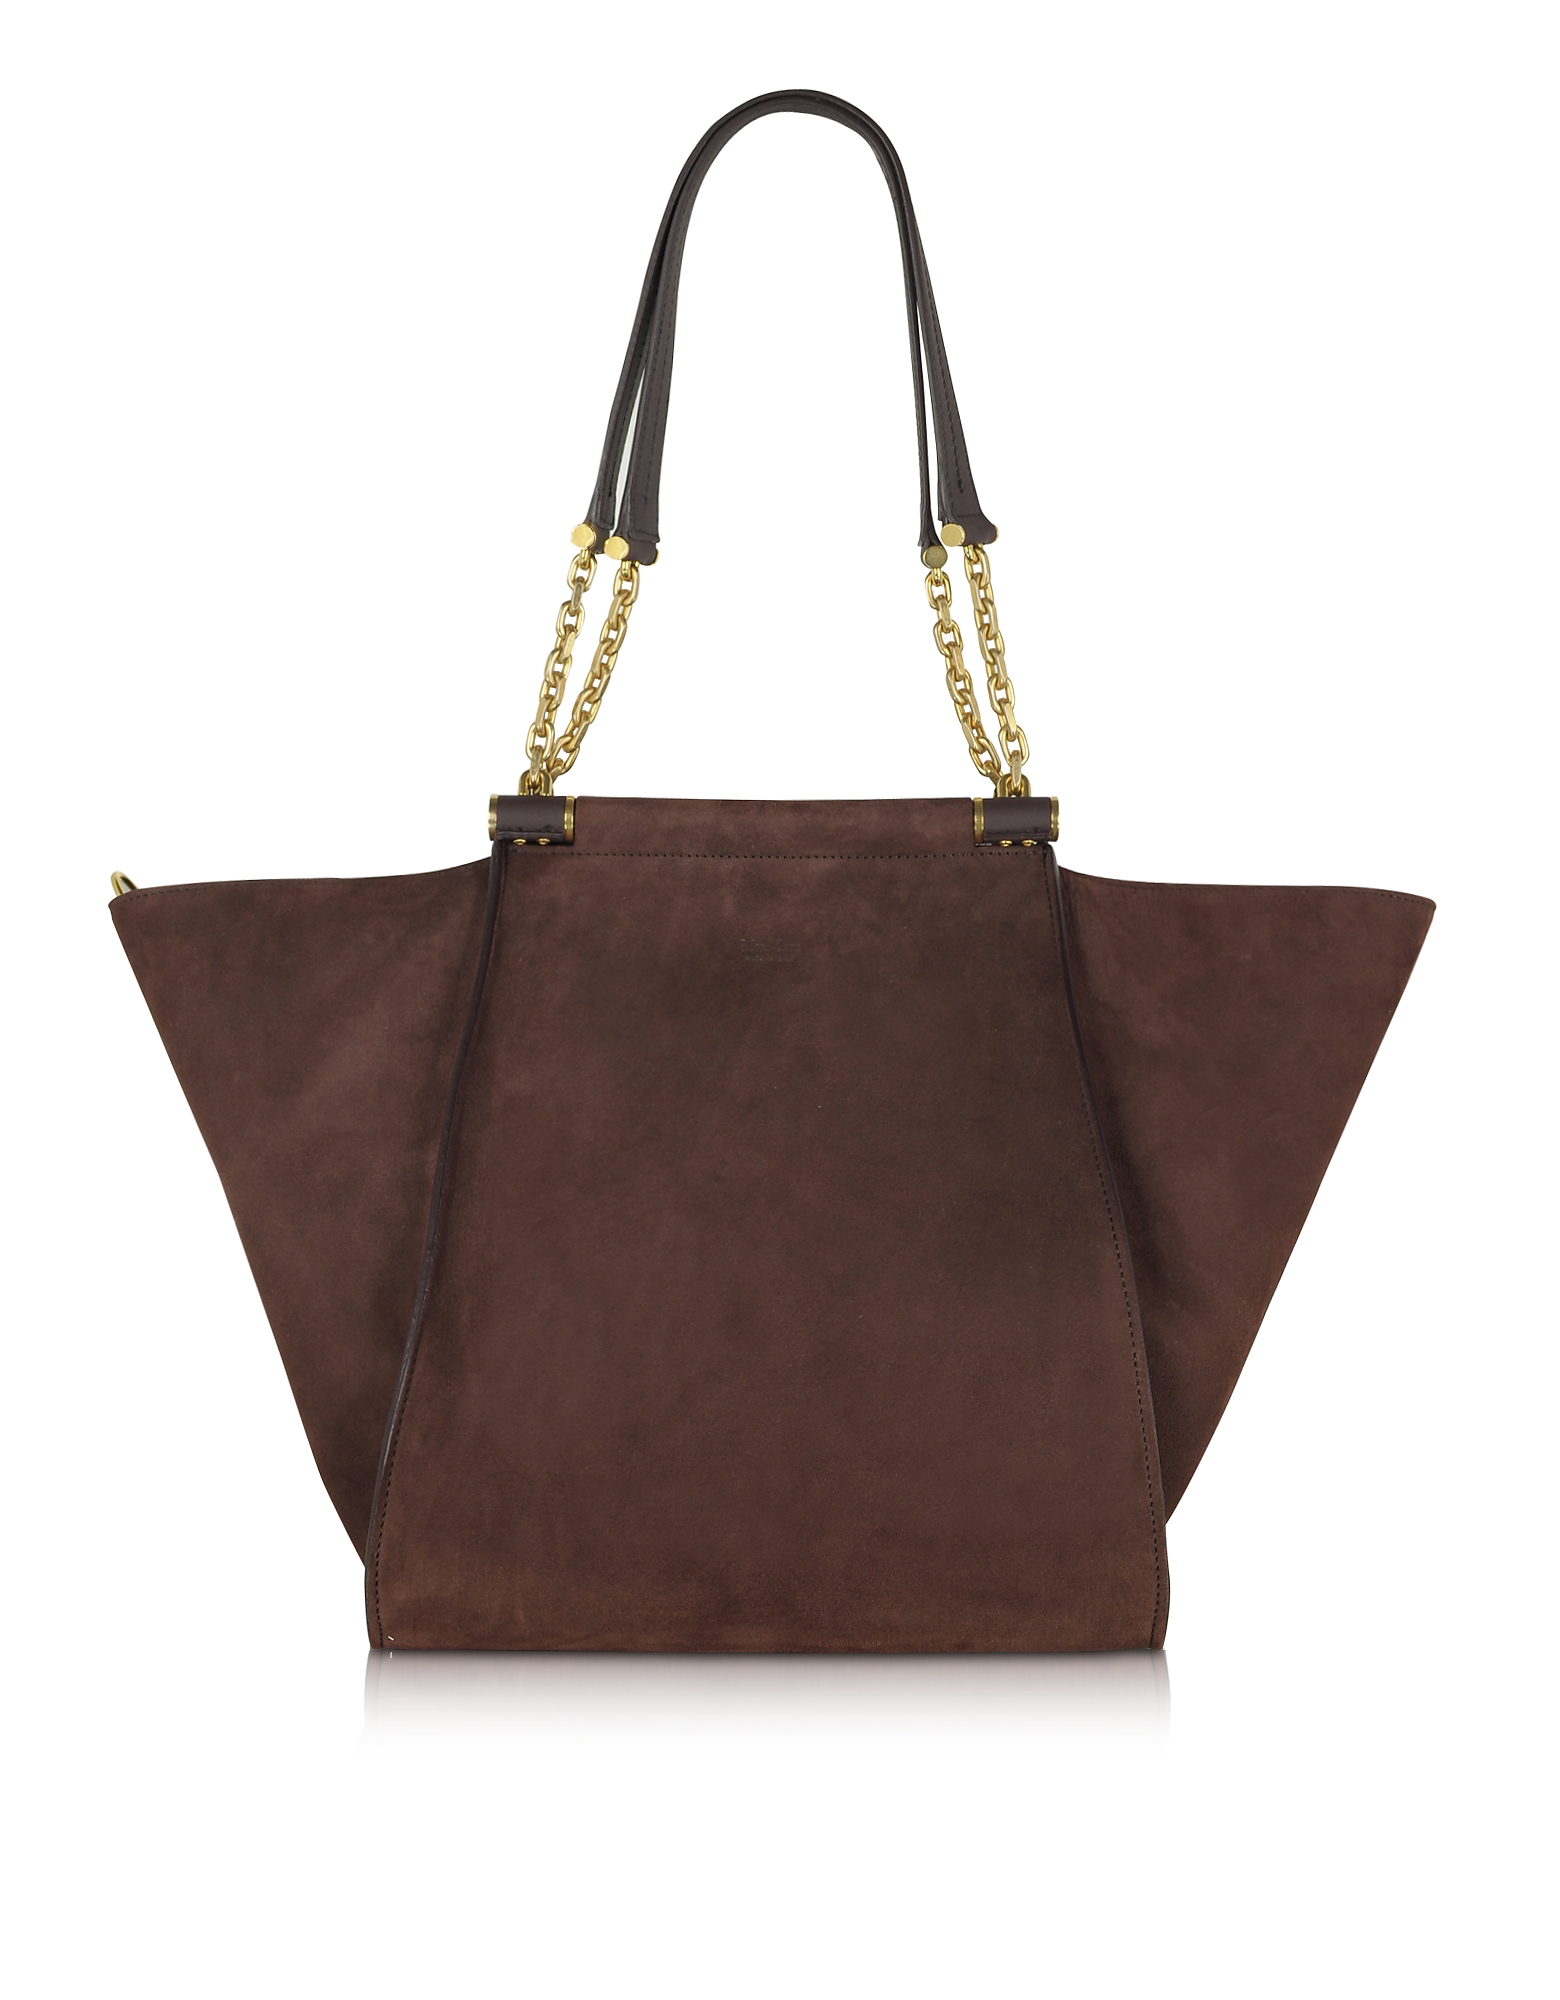 Max Mara Designer Handbags, Chain Large Suede Shoulder Bag w/Chain Straps